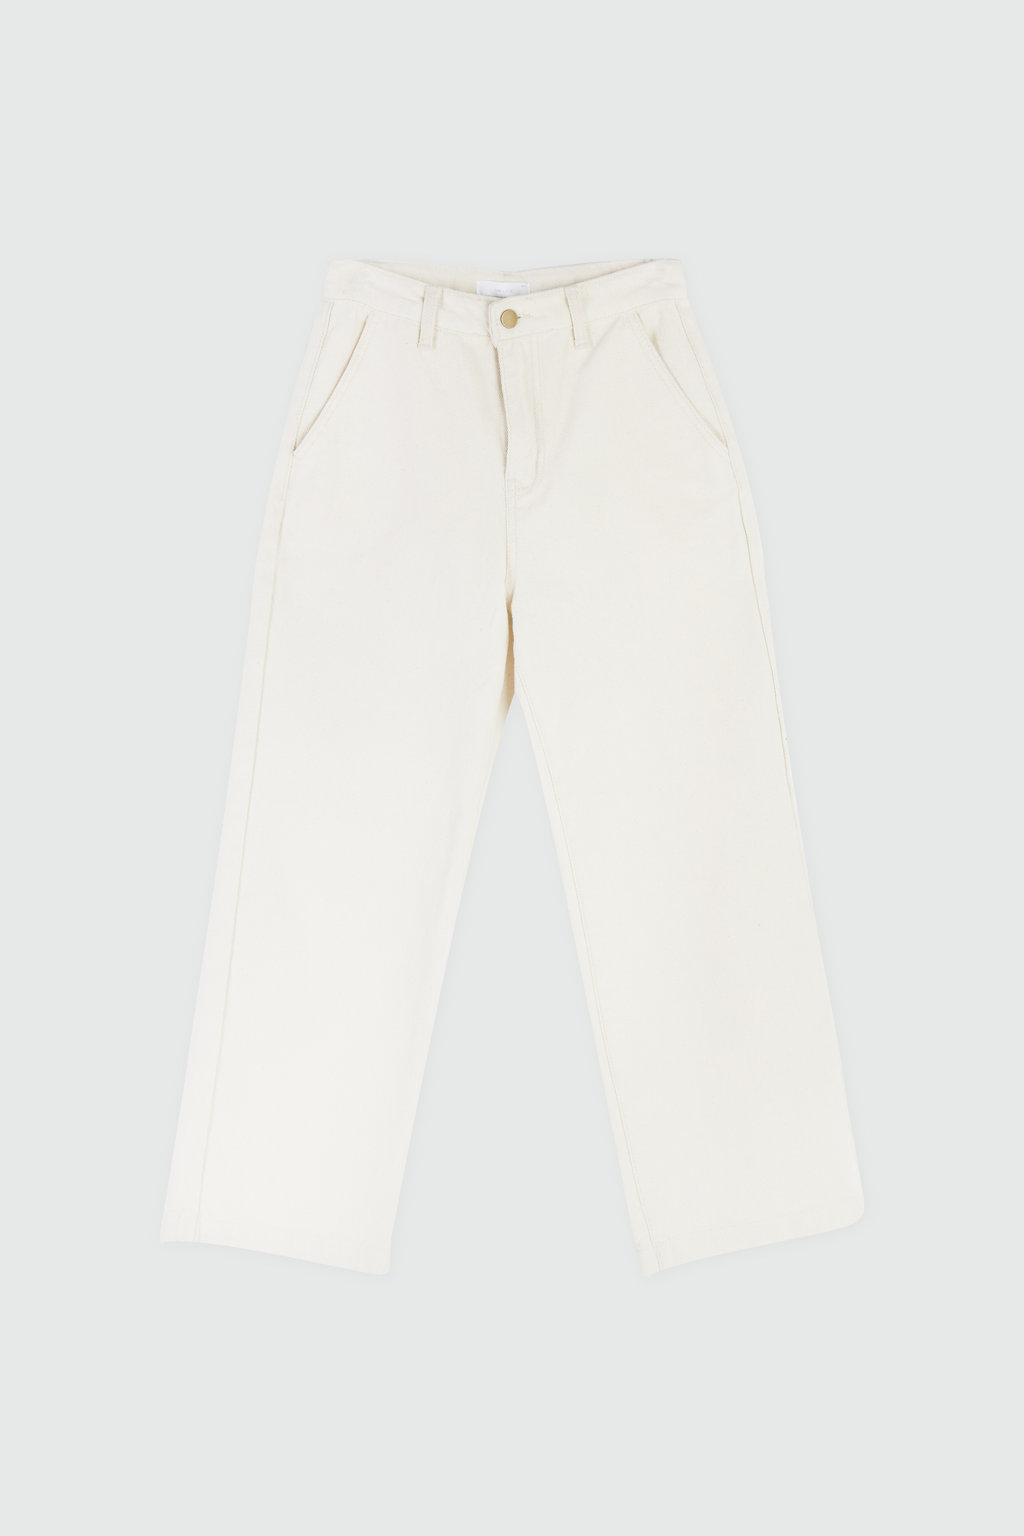 Jean J010 Cream 7